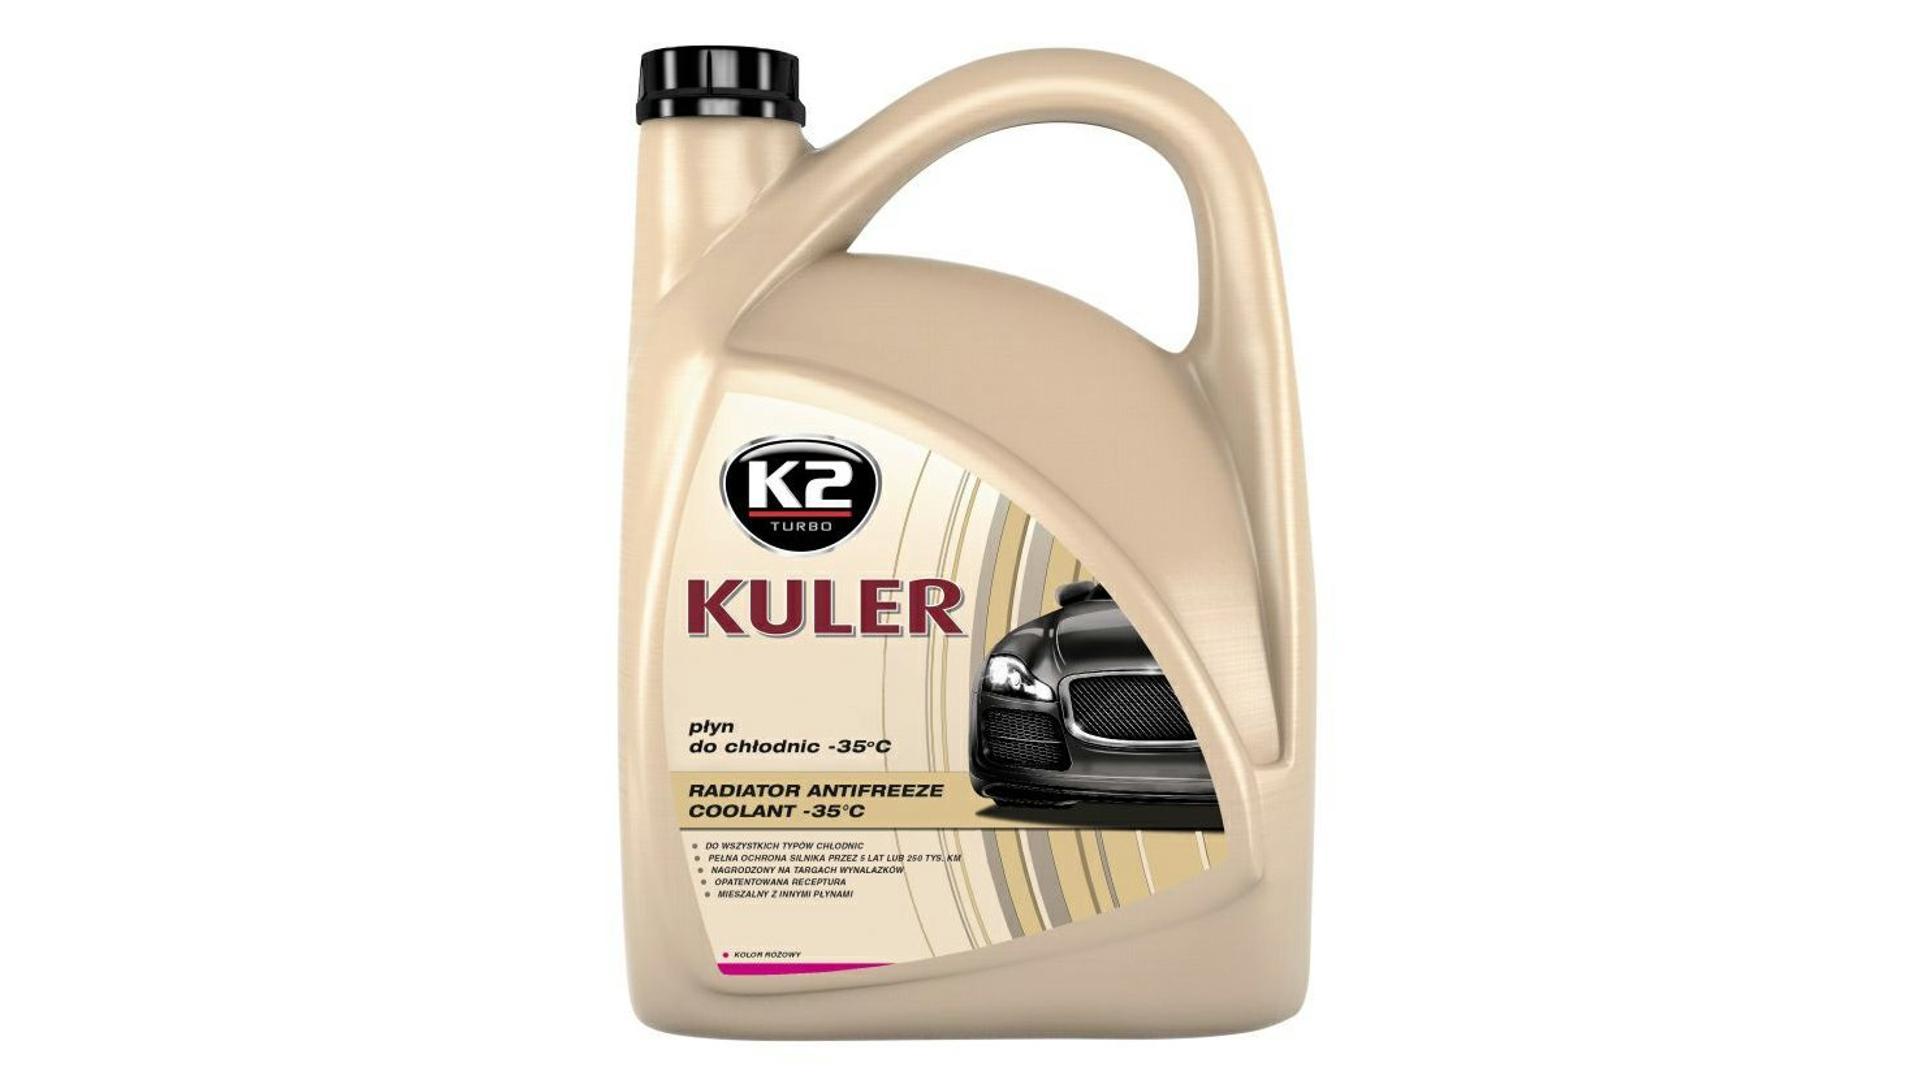 K2 Kuler RUŽOVÁ 5 l - nemrznúca kvapalina do chladiča do -35 ° C